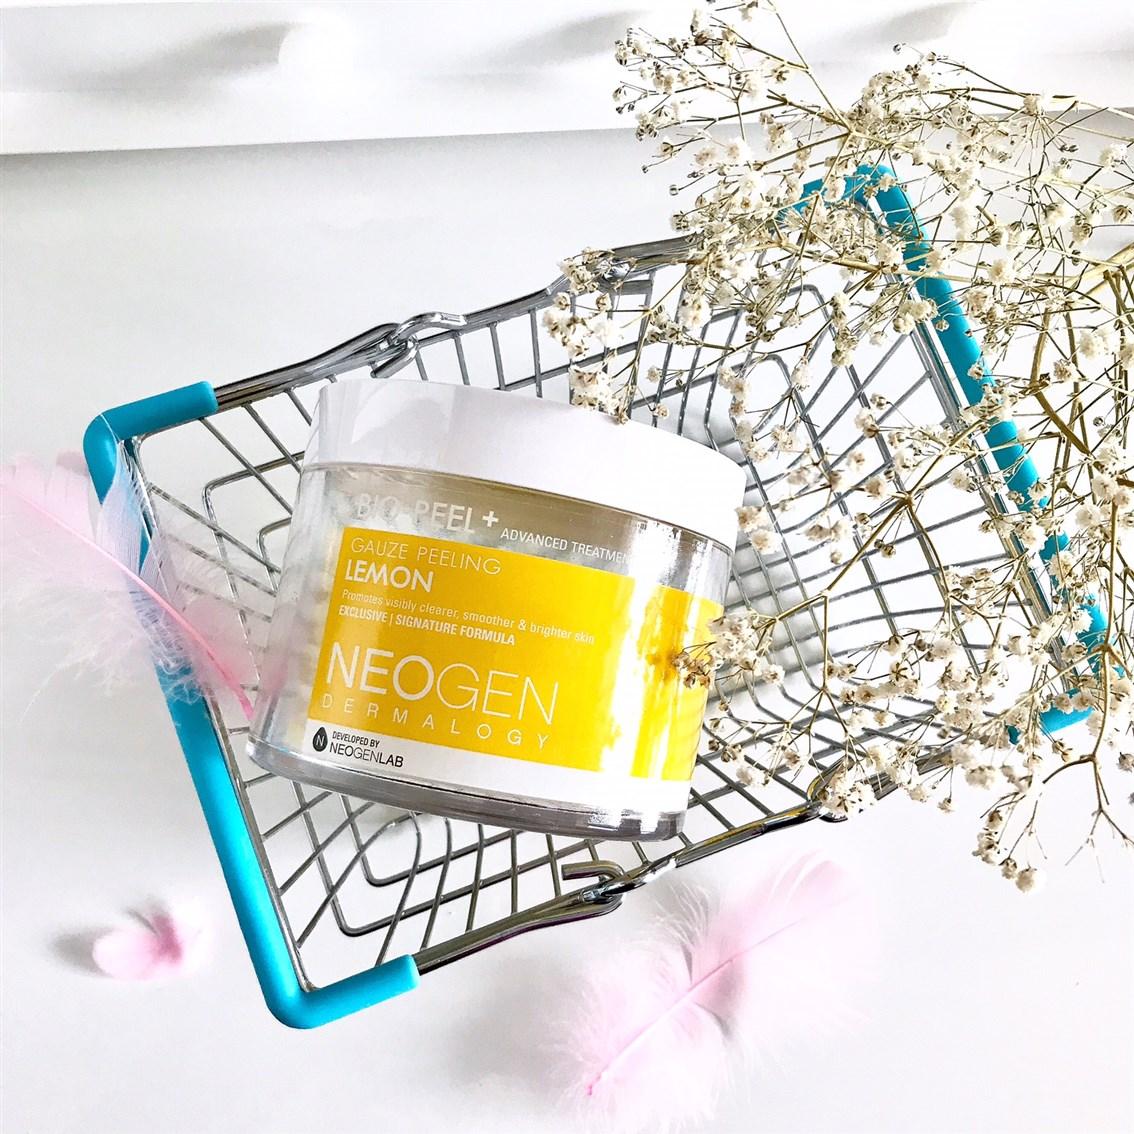 Neogen Bio Peel Gauze Lemon